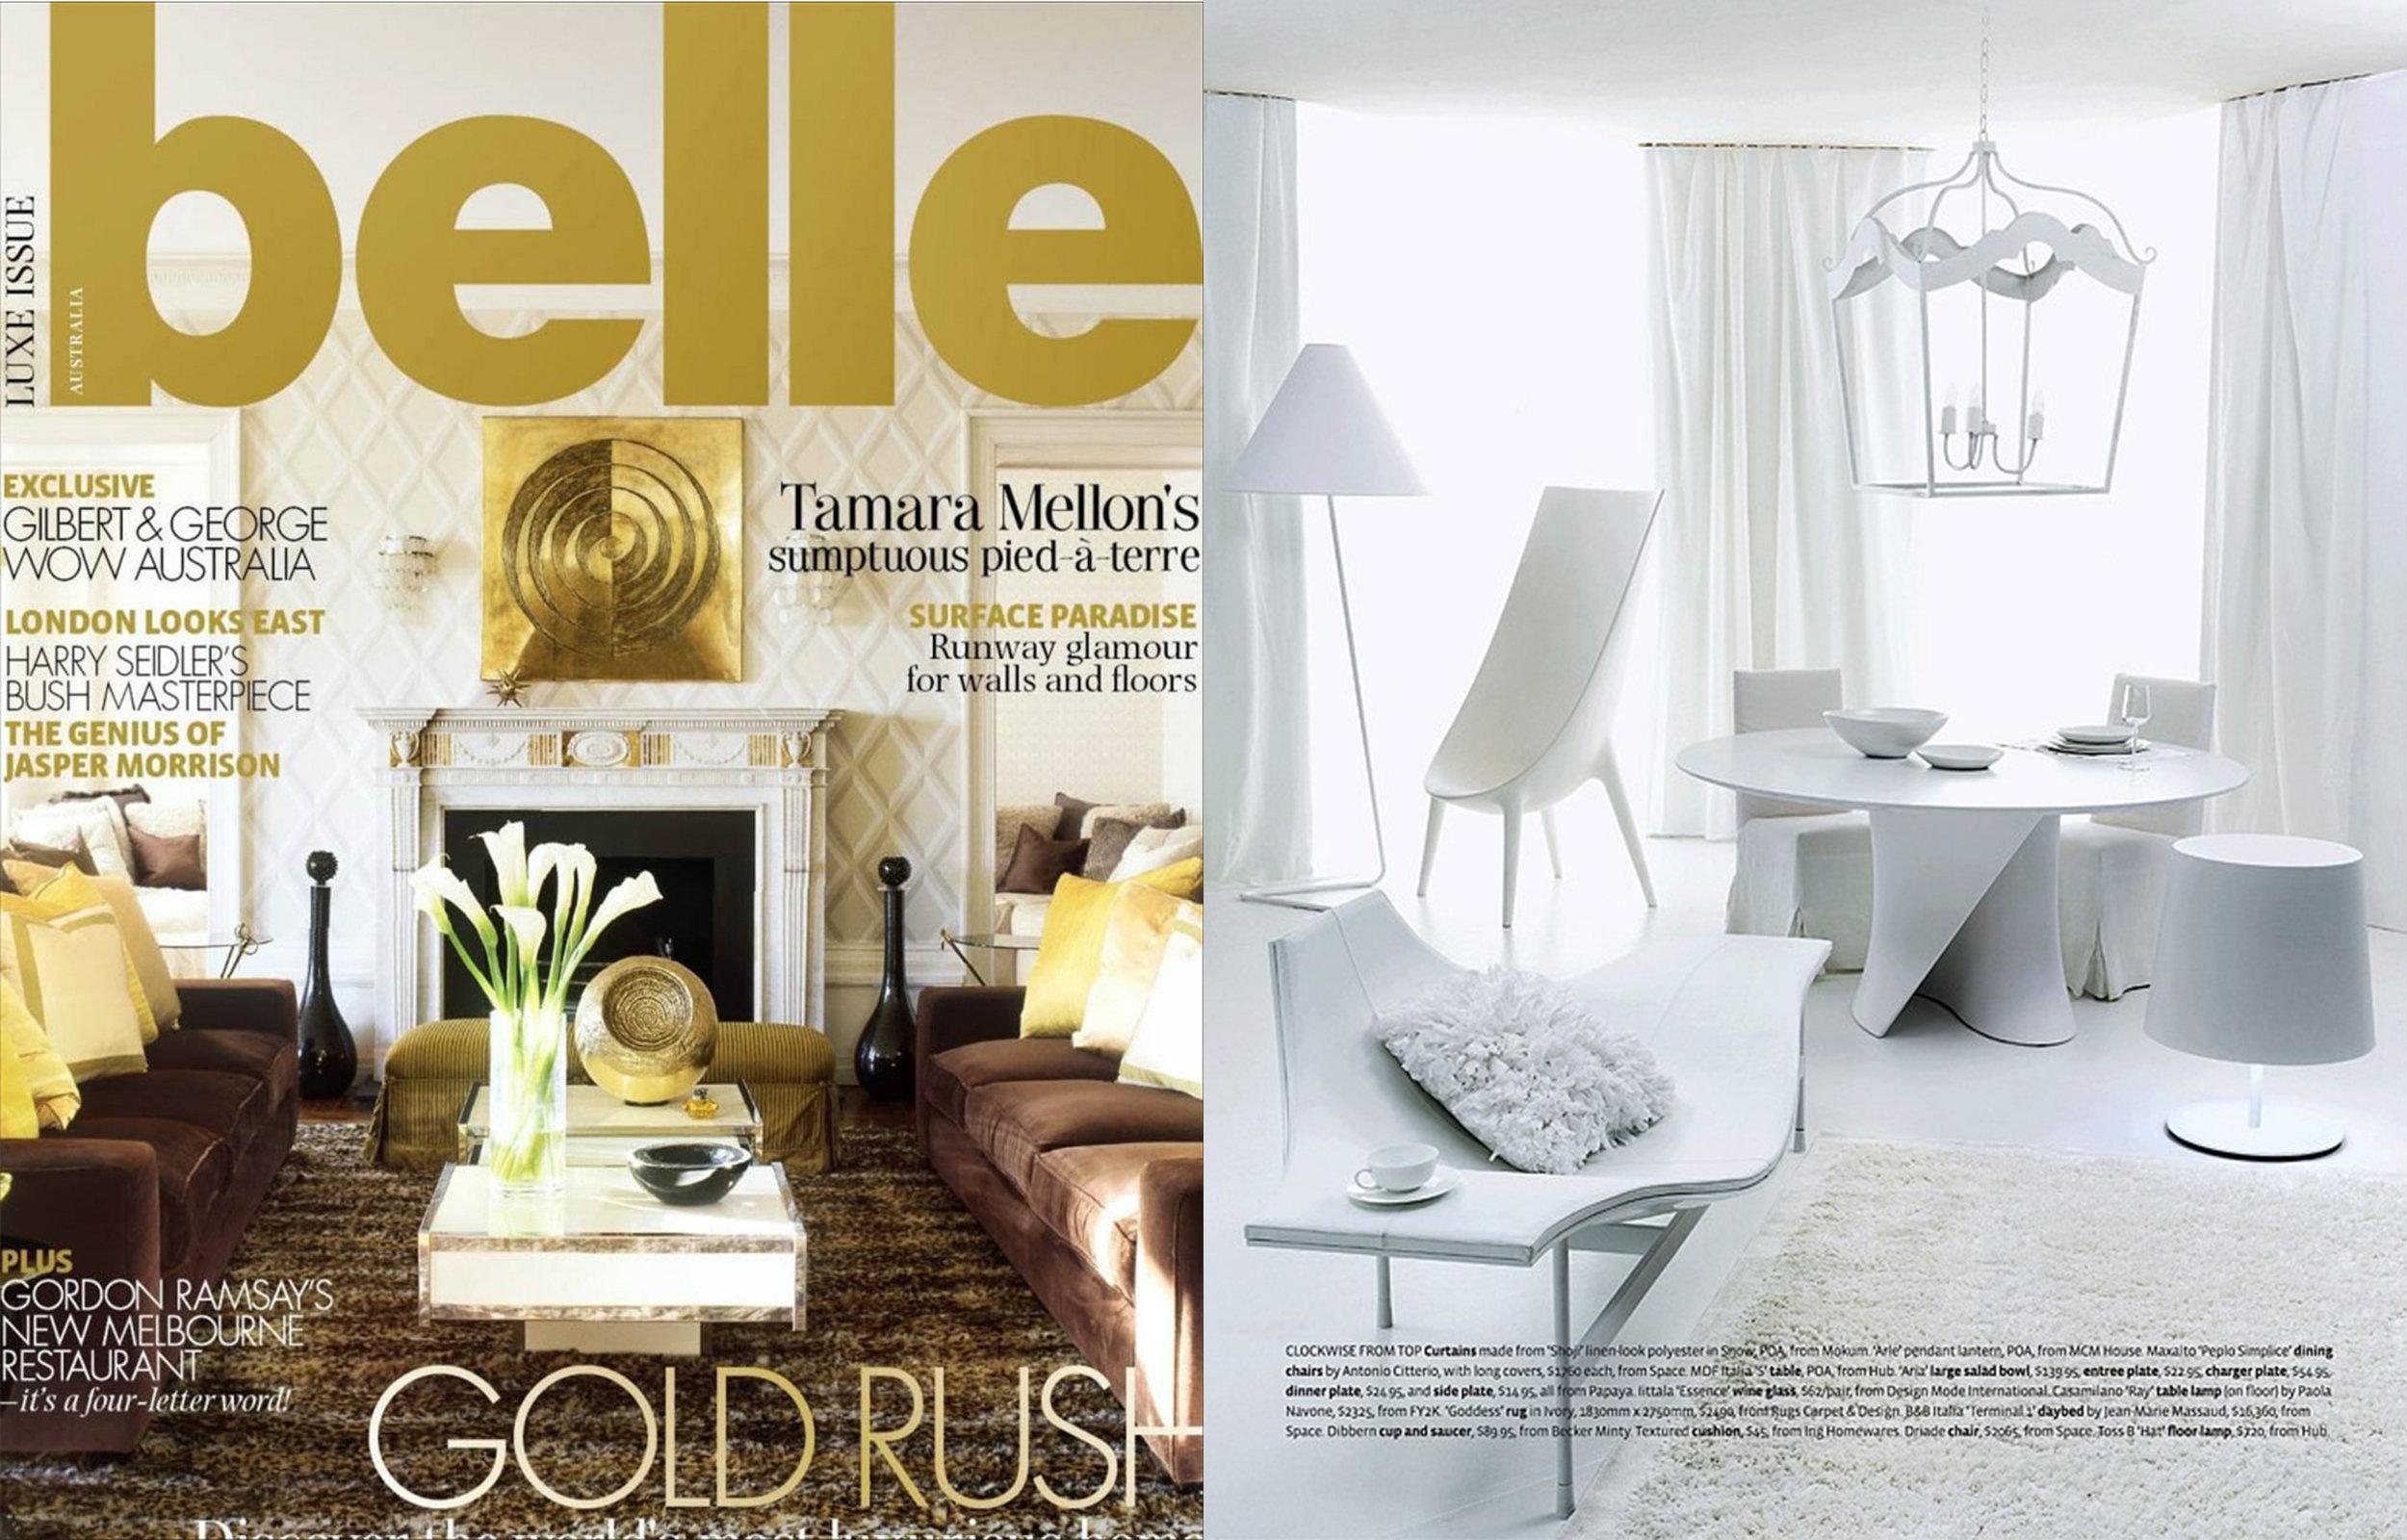 Belle Magazine - Jun/Jul 2010